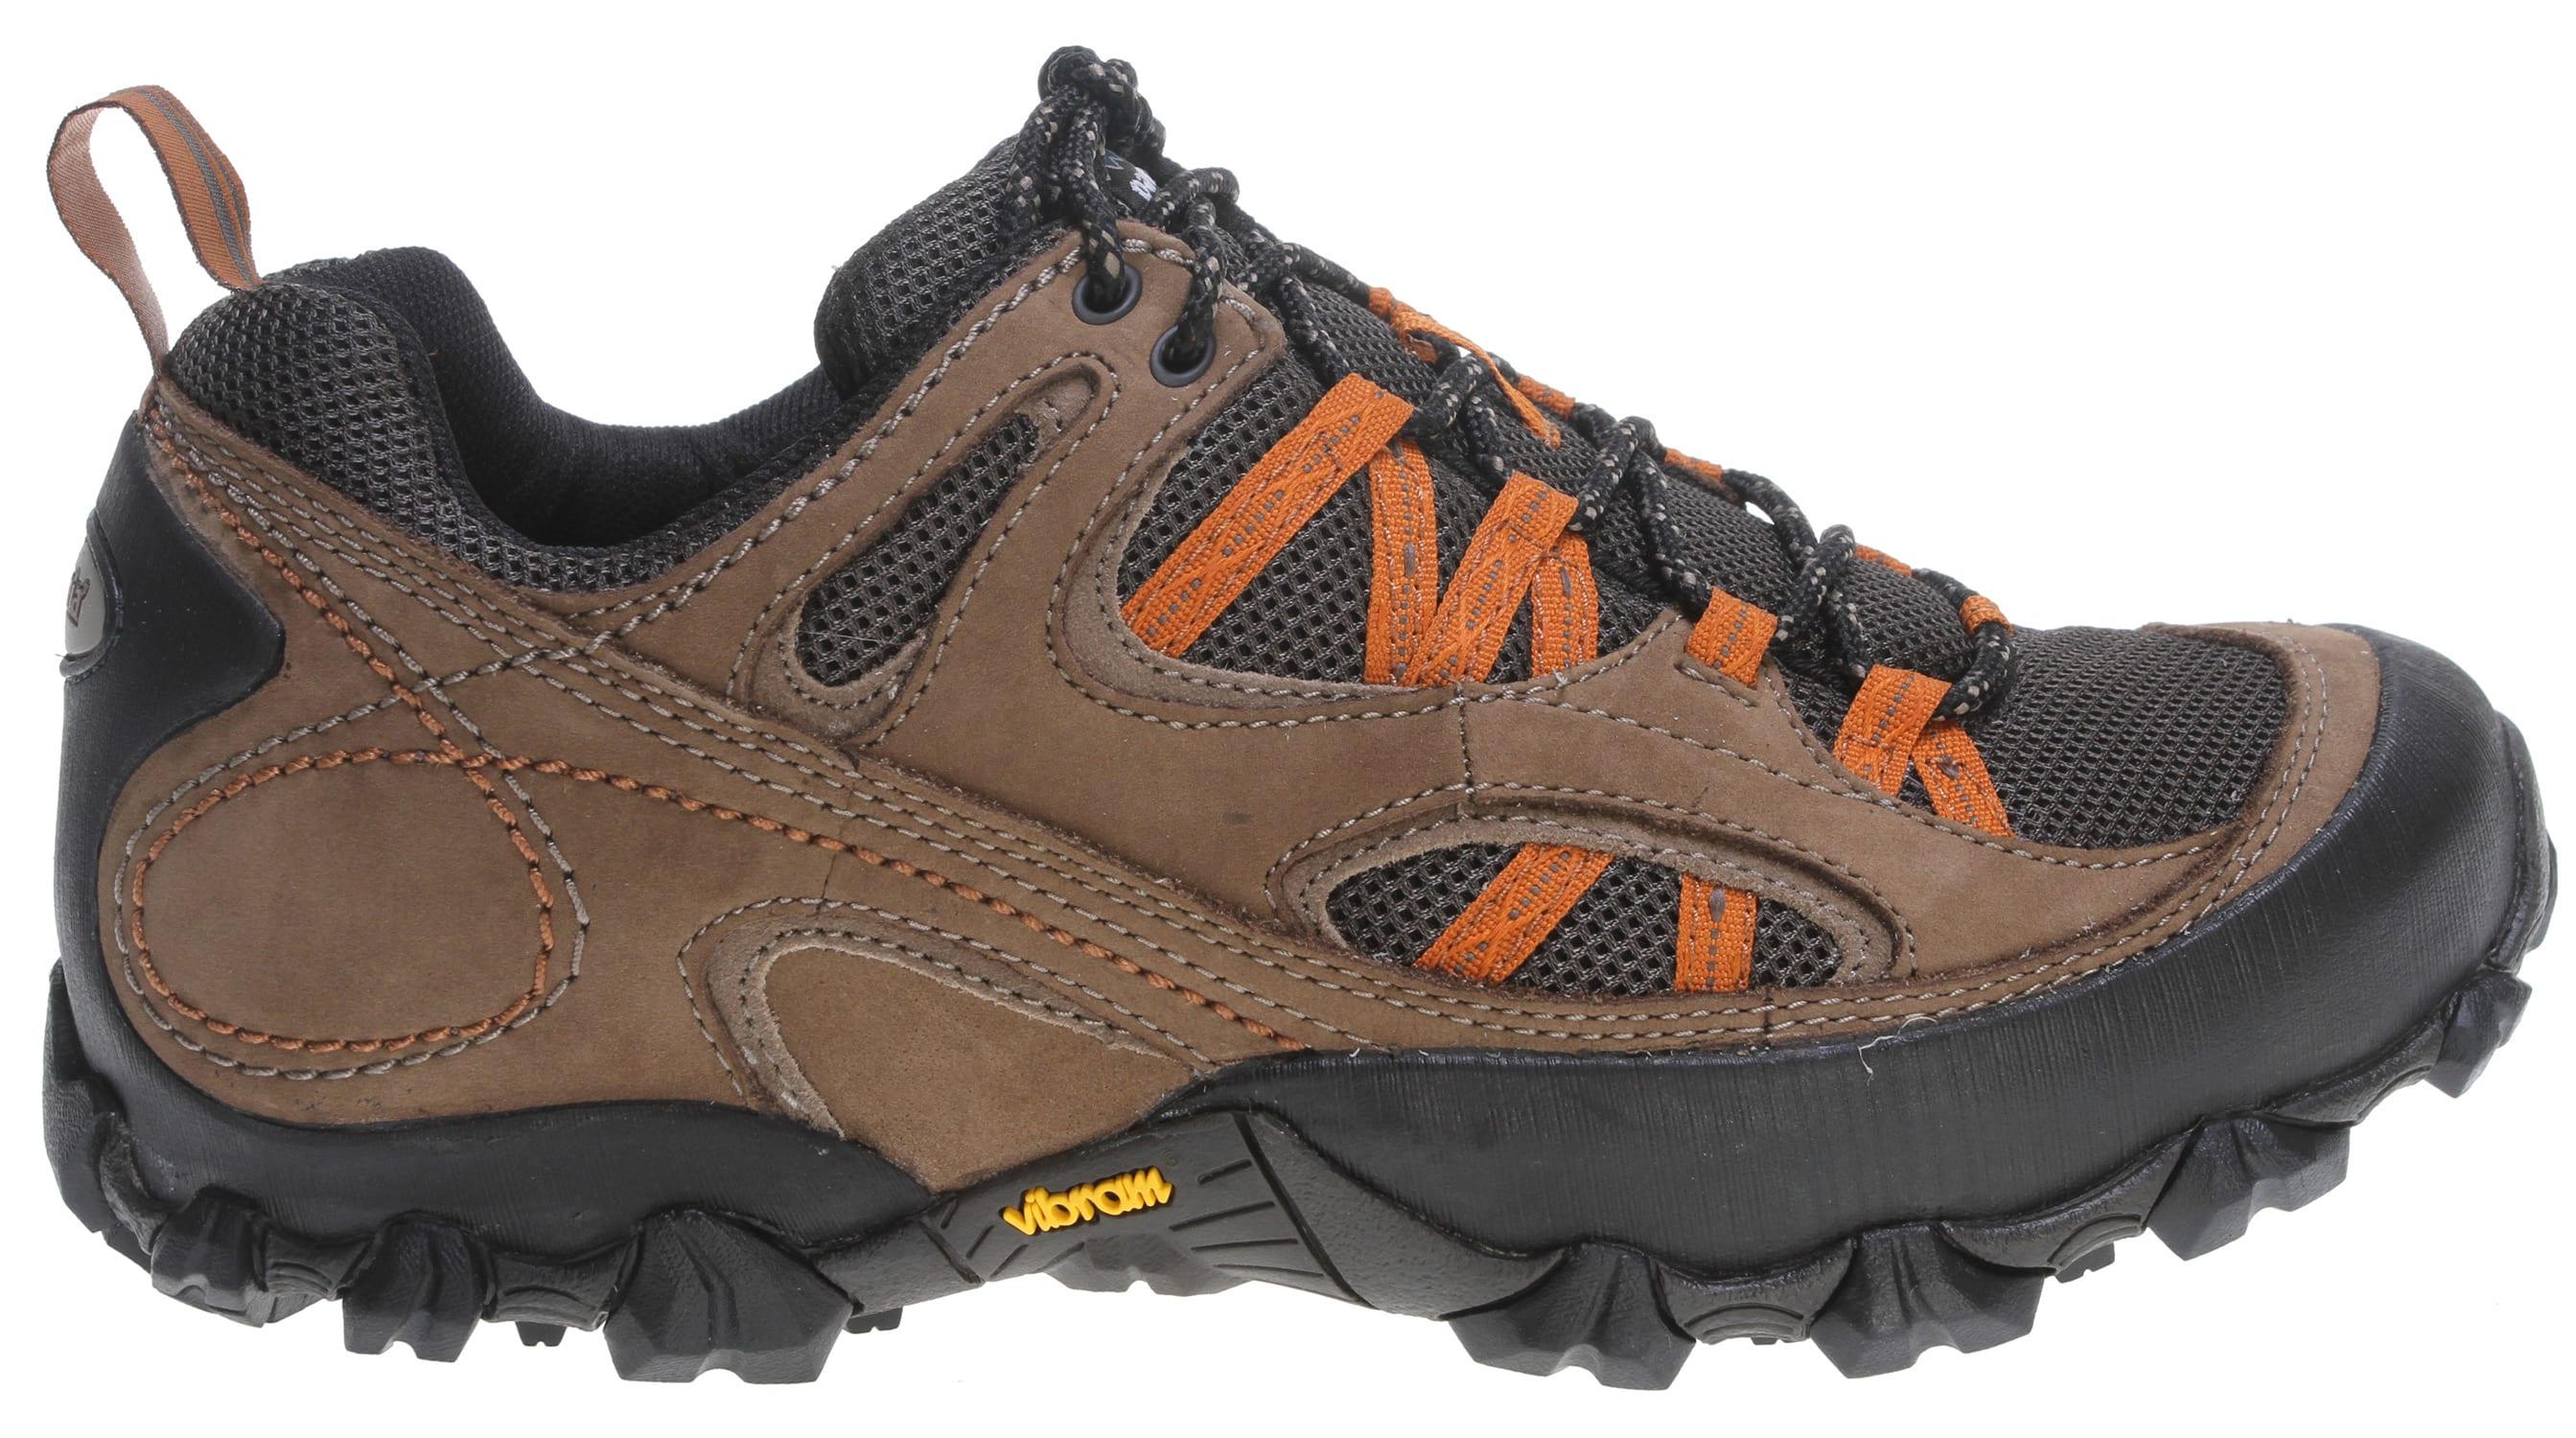 f81c046d425 Patagonia Drifter A C Hiking Shoes - thumbnail 1